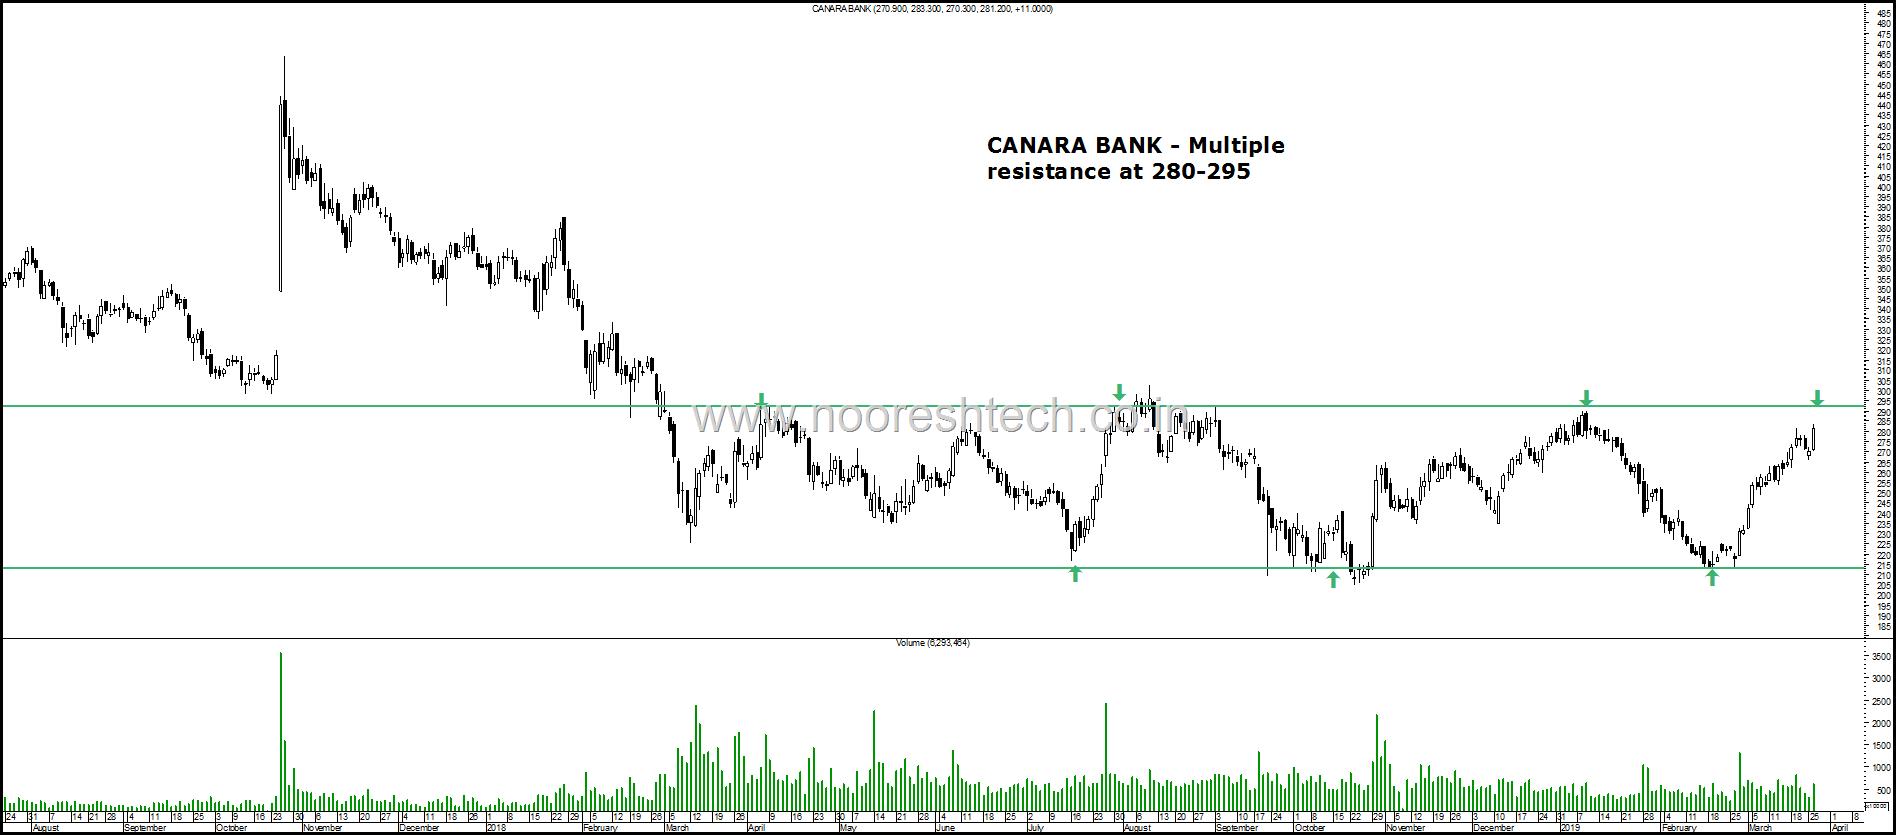 Canara Bank p